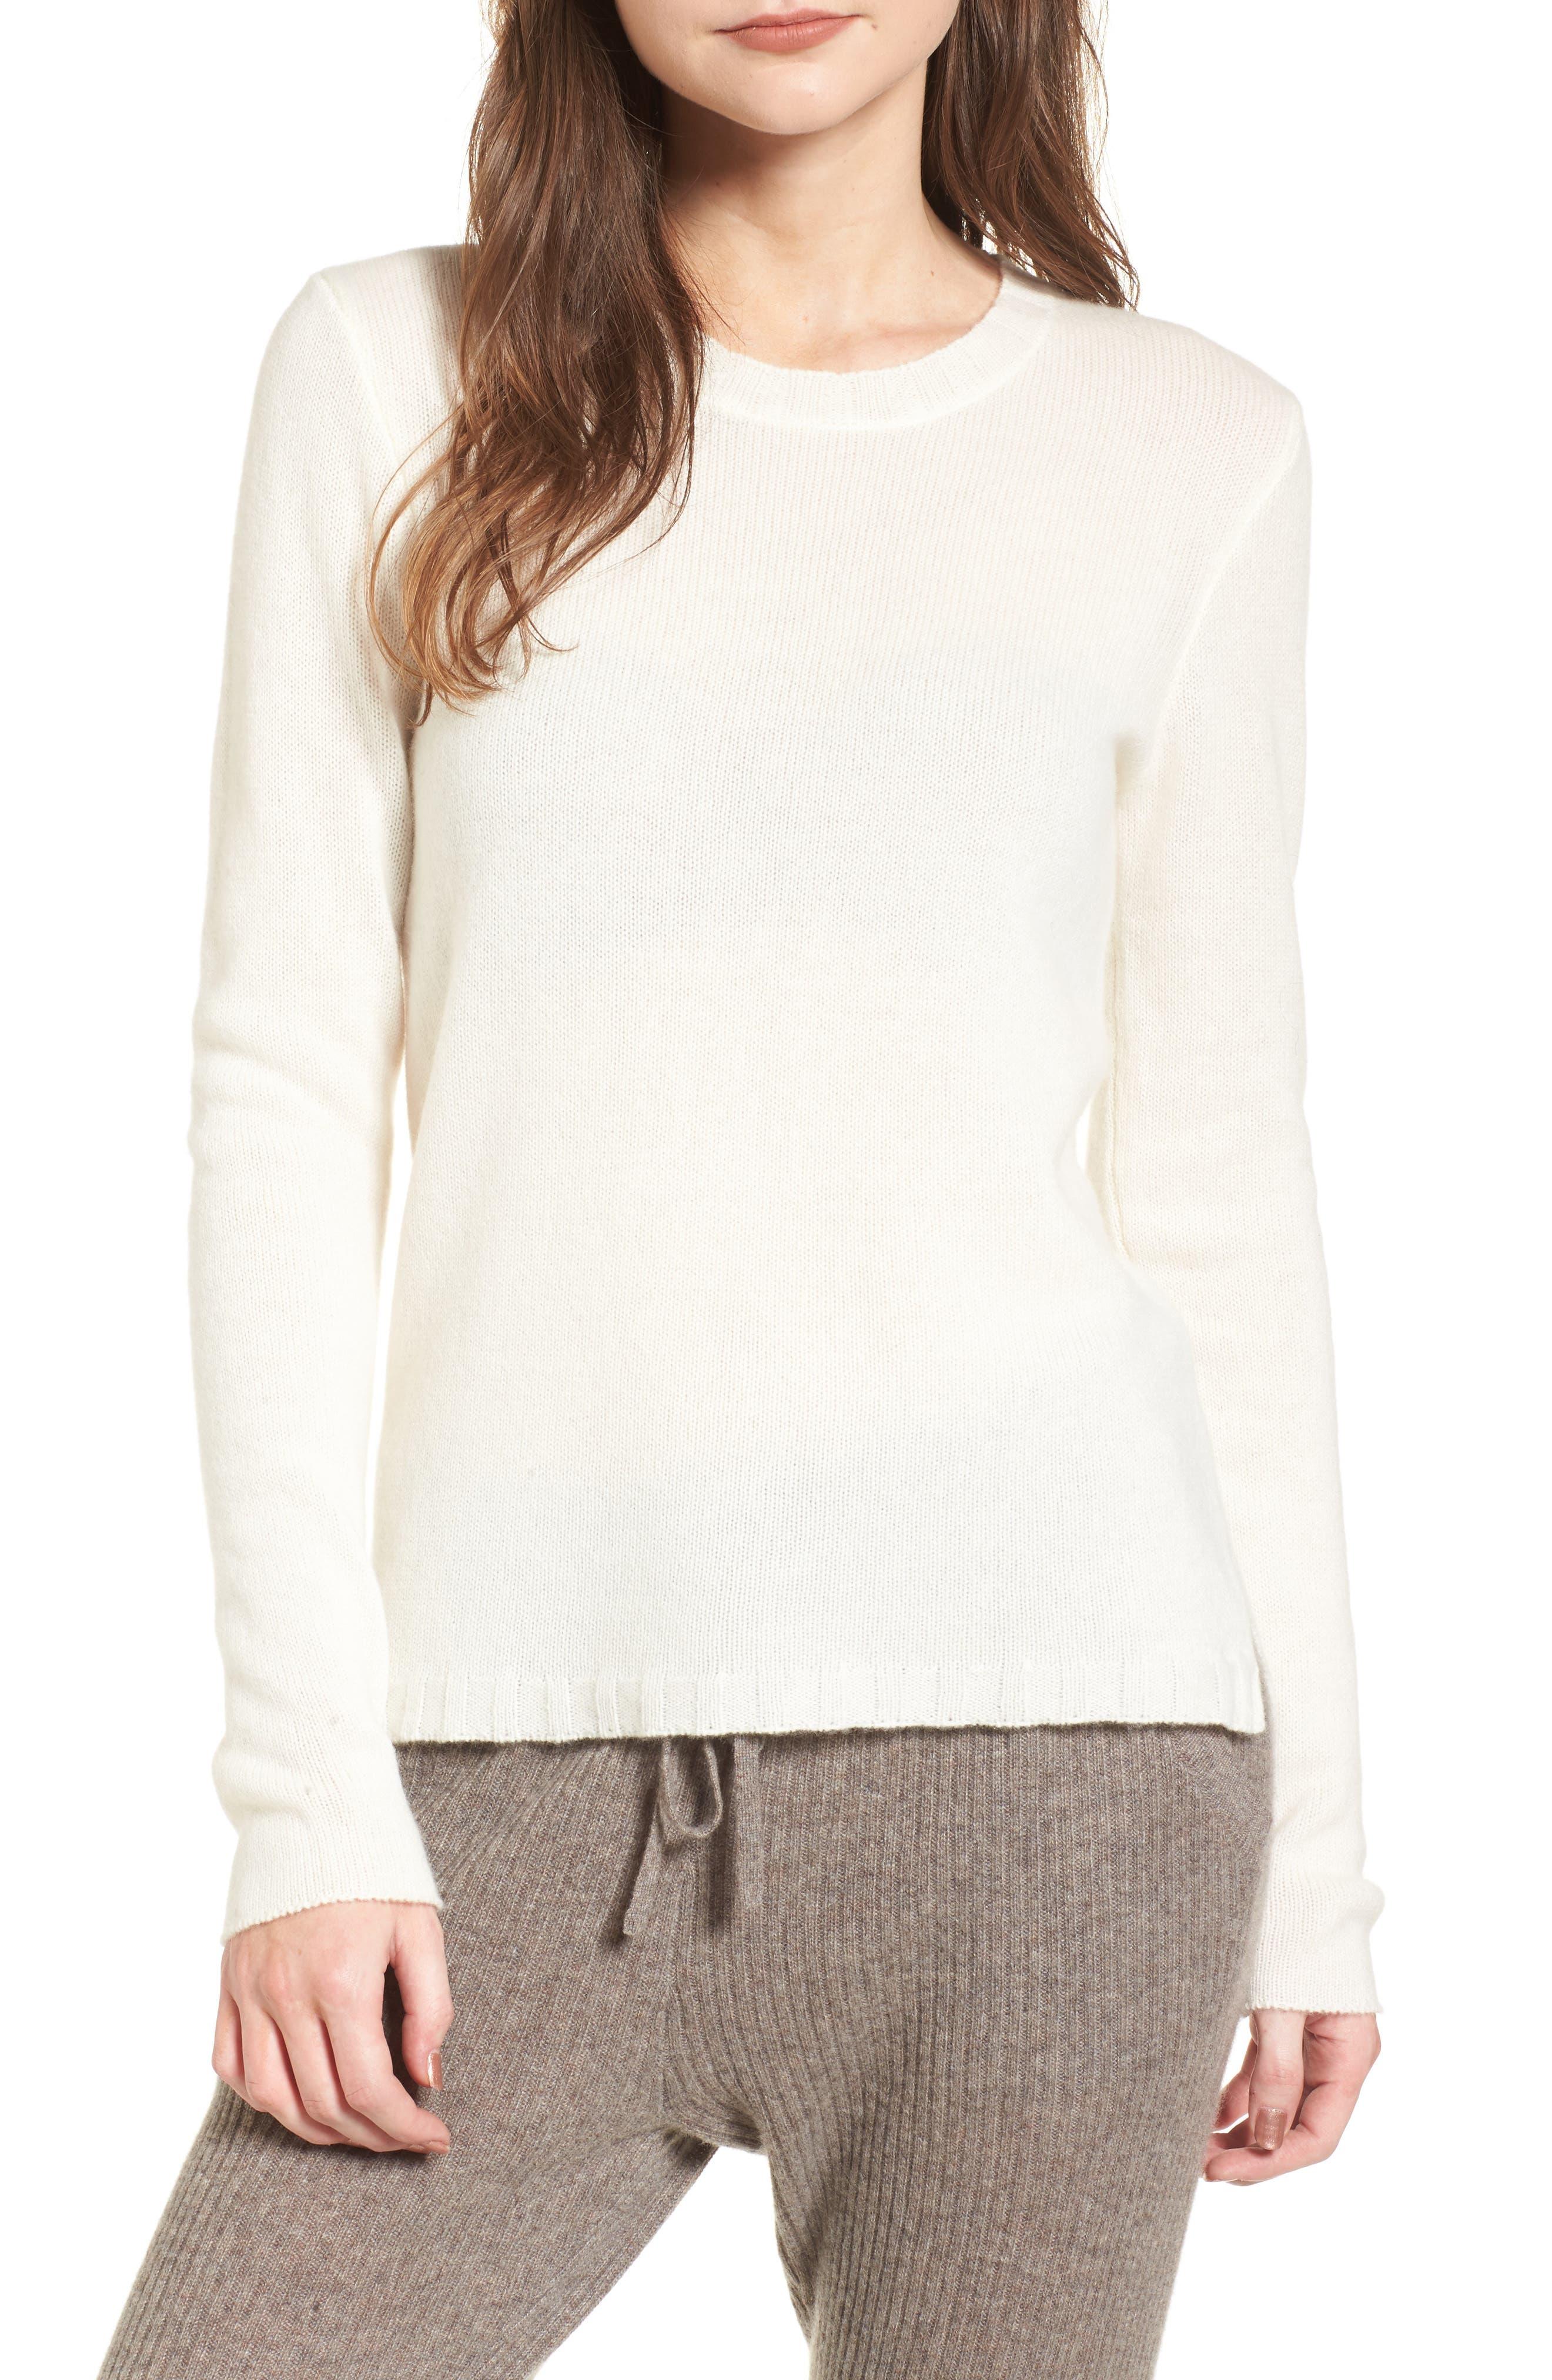 Alternate Image 1 Selected - James Perse Cashmere Crewneck Sweater